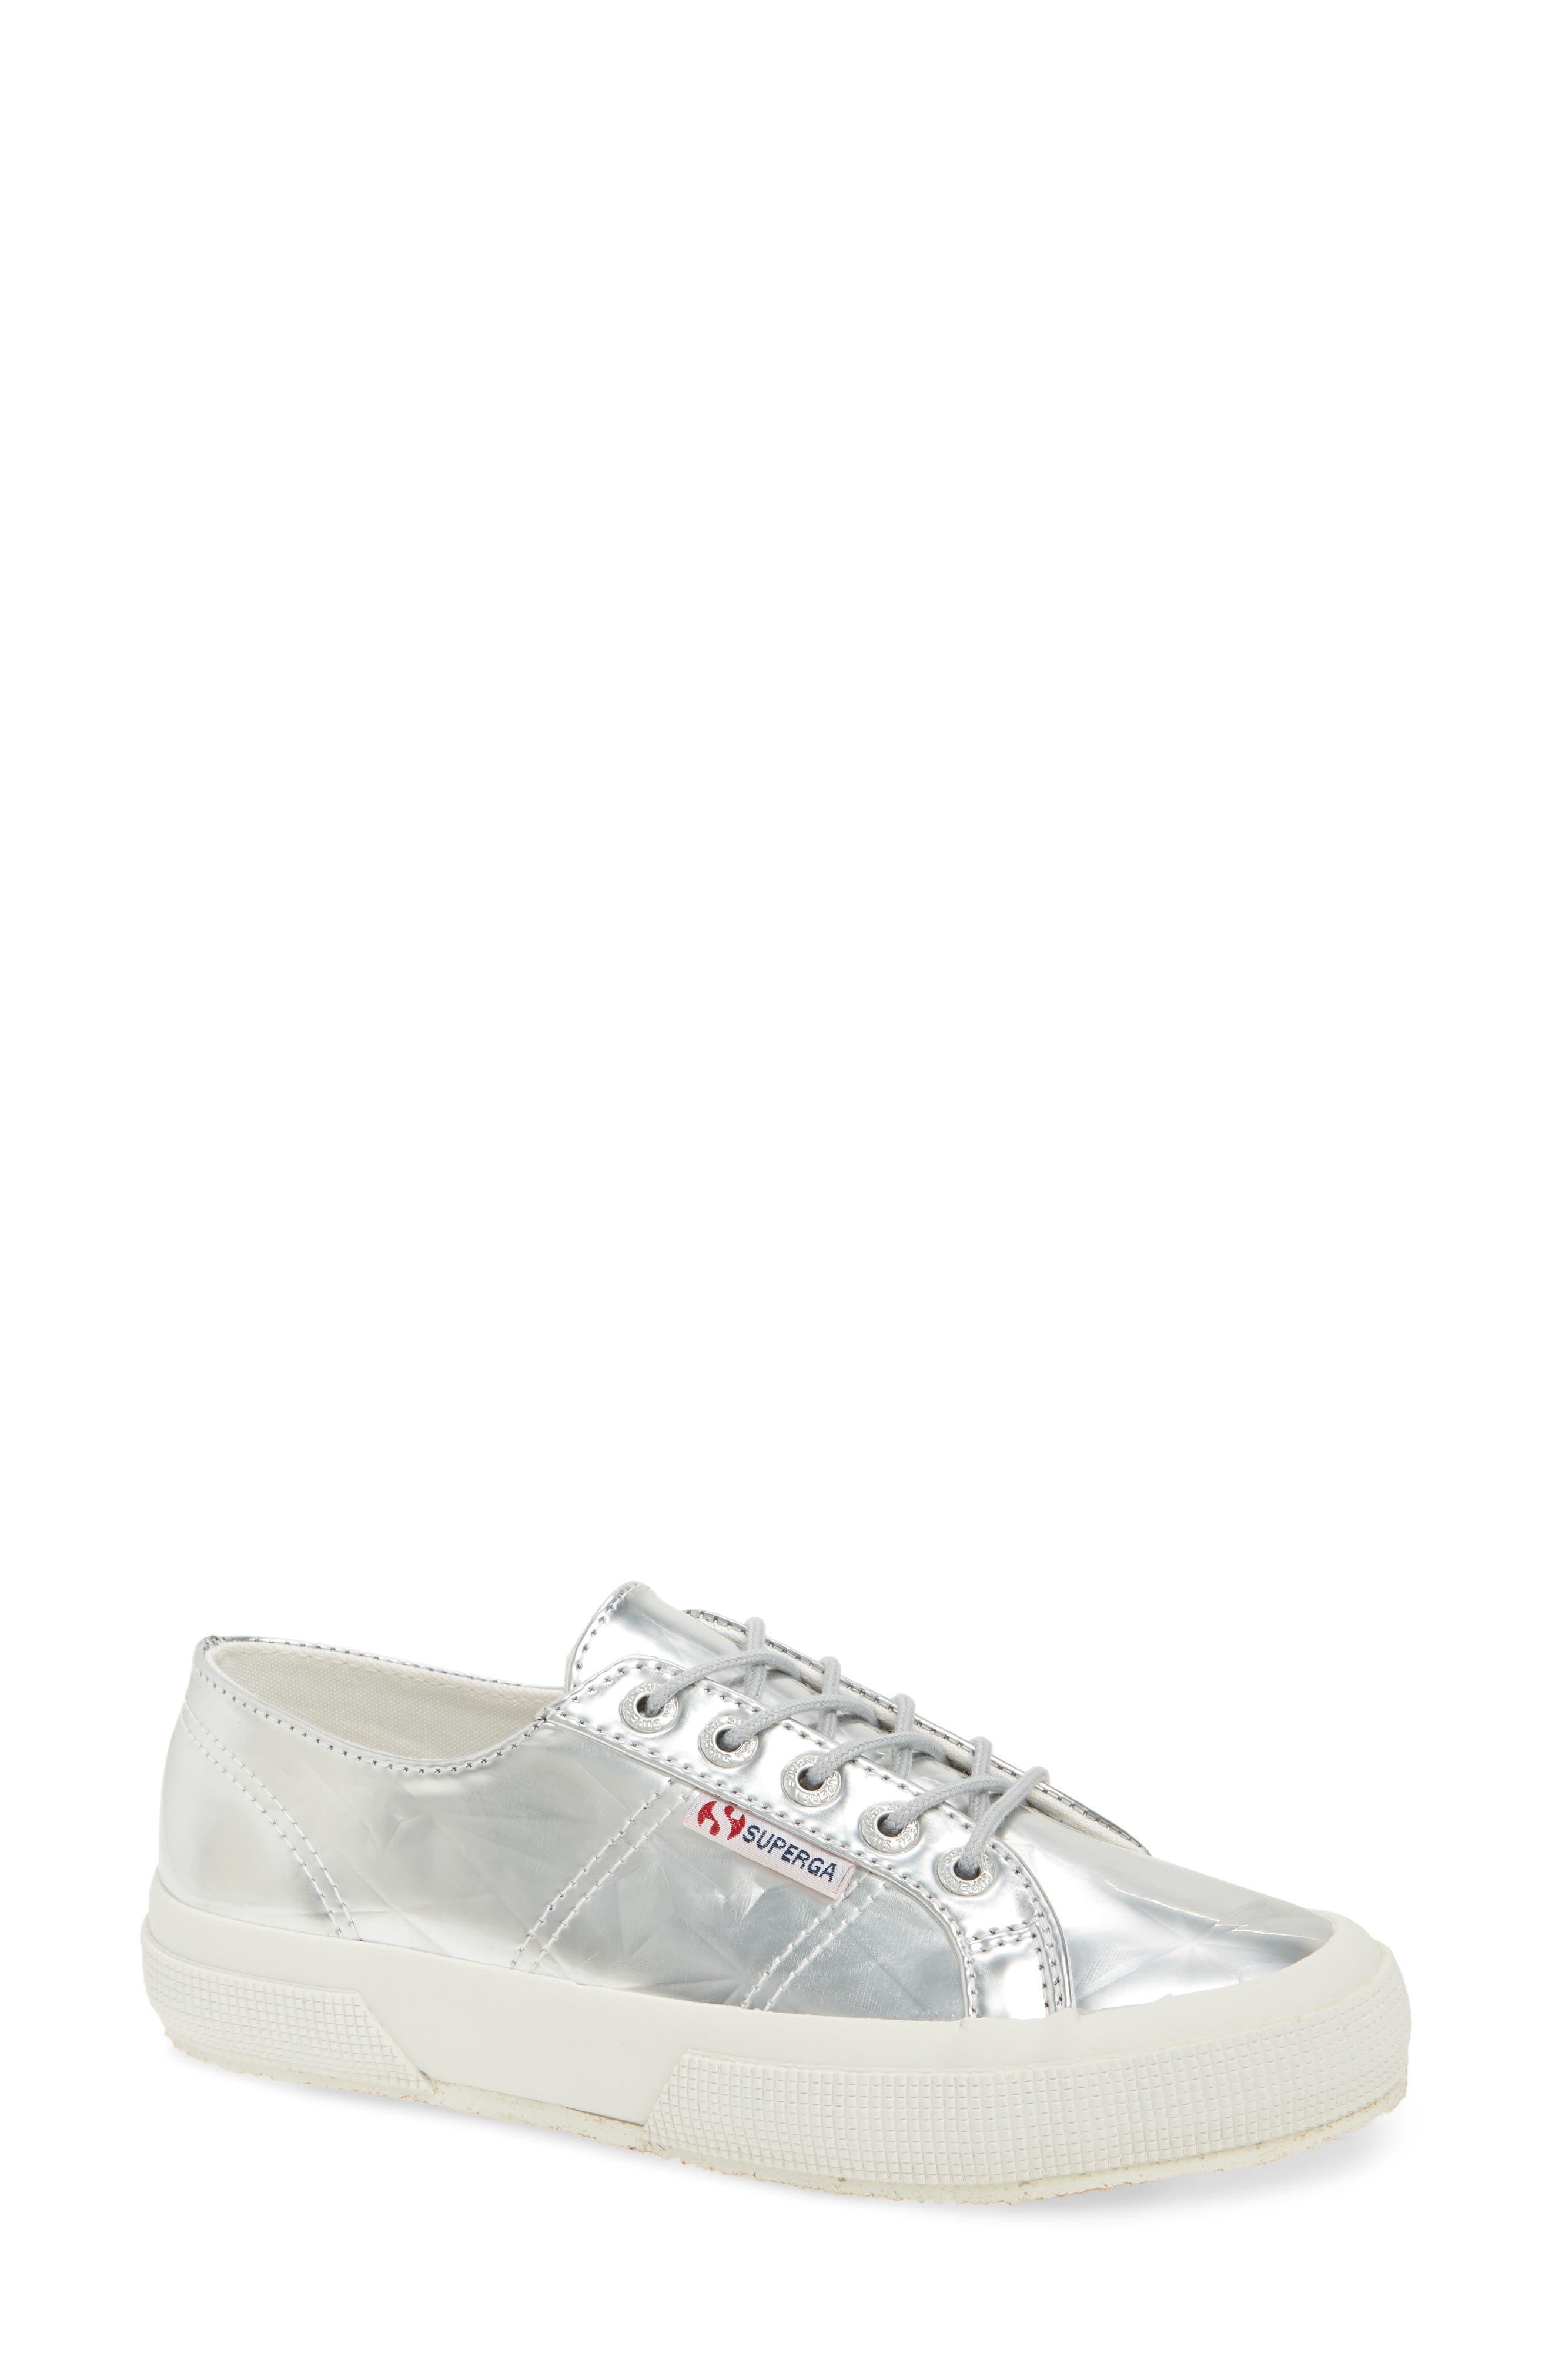 2750 Synleadiamondmirror Sneaker,                             Main thumbnail 1, color,                             040